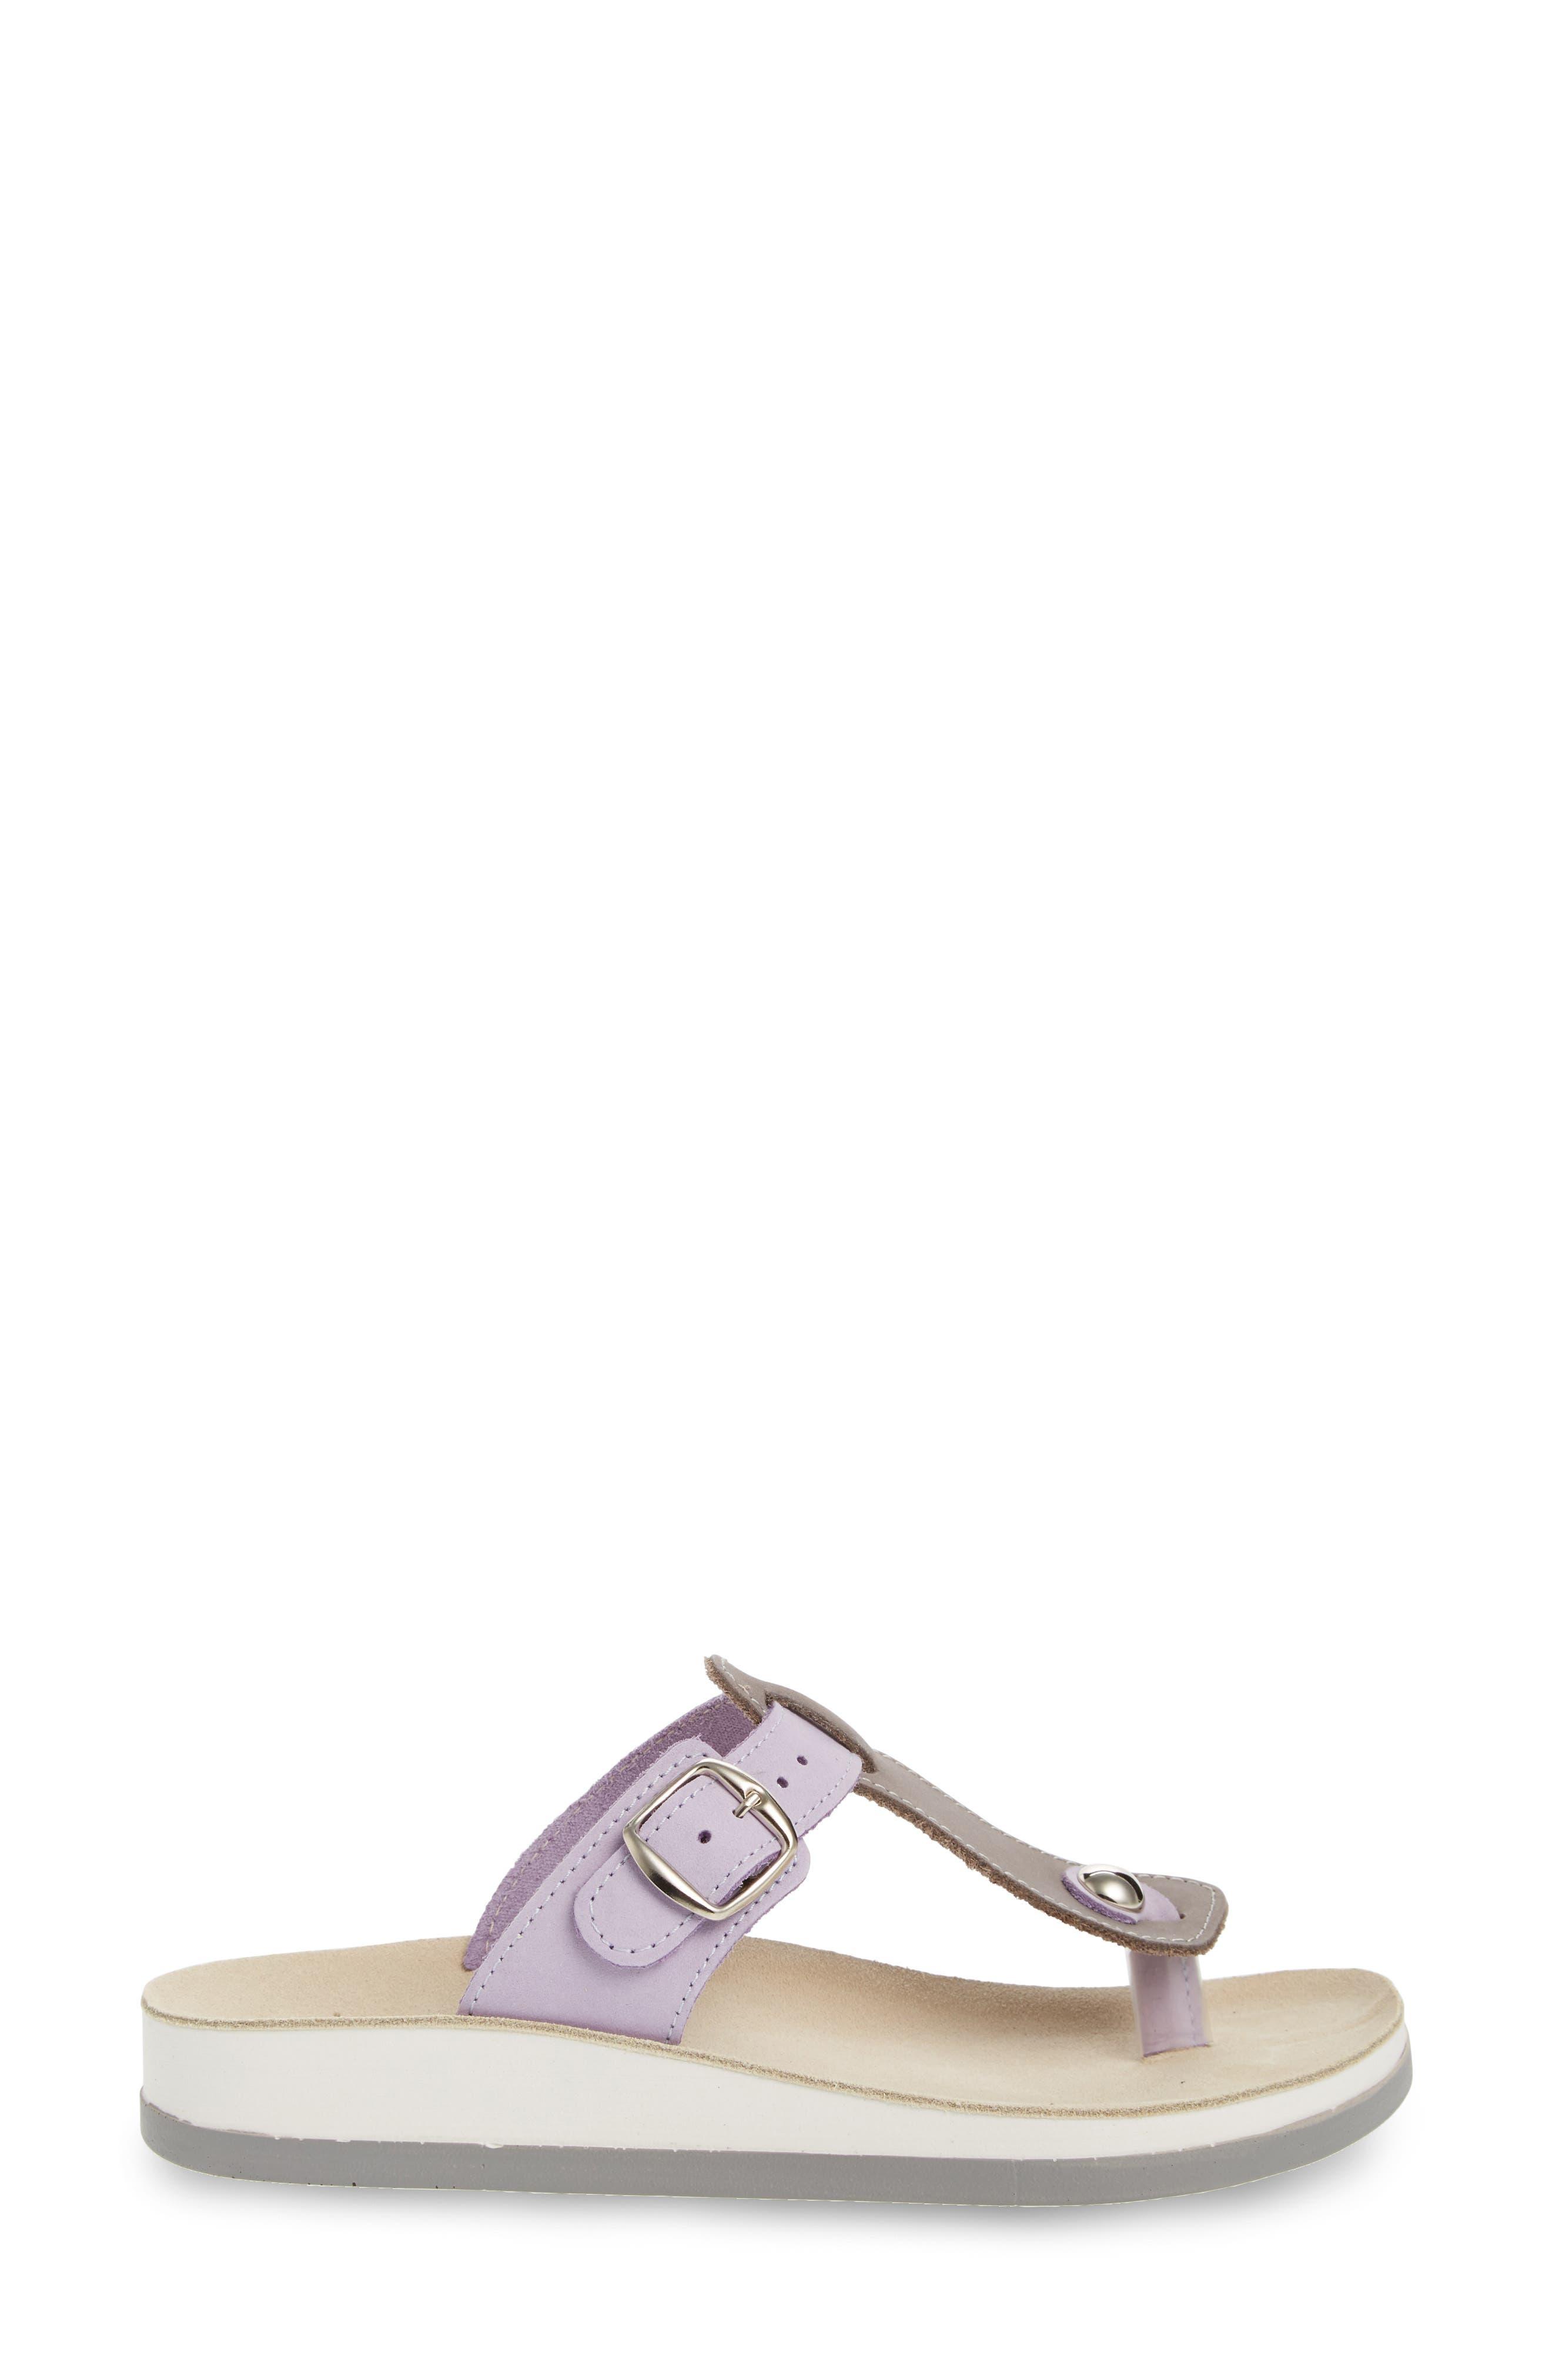 Viola Sandal,                             Alternate thumbnail 3, color,                             Lila Grey Leather